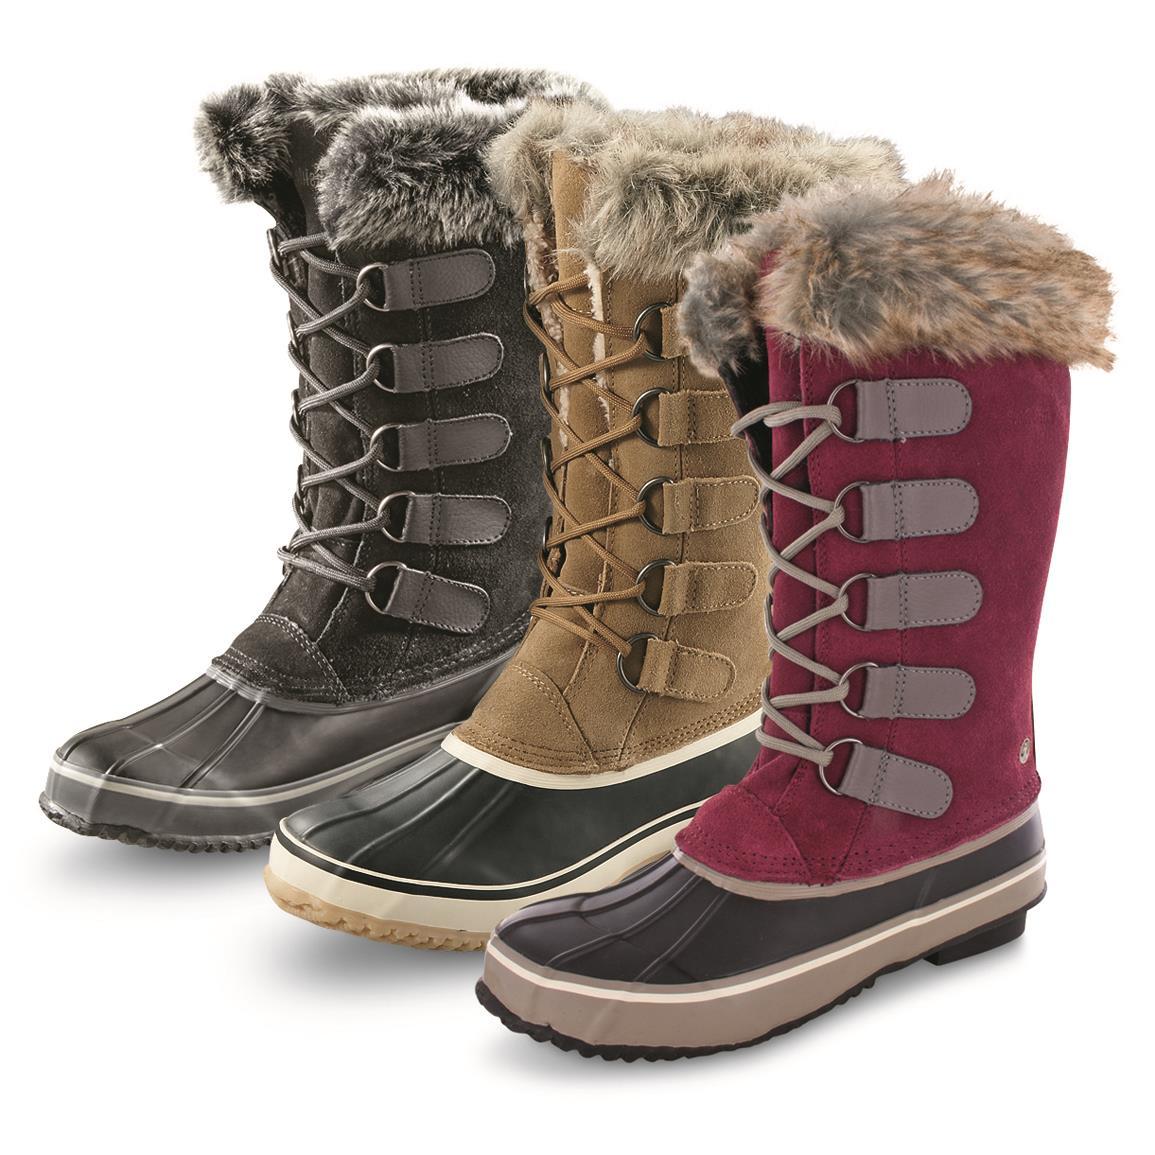 snow boots northside womenu0027s kathmandu insulated waterproof winter boots, 200 grams,  onyx (x49 ELAQETW